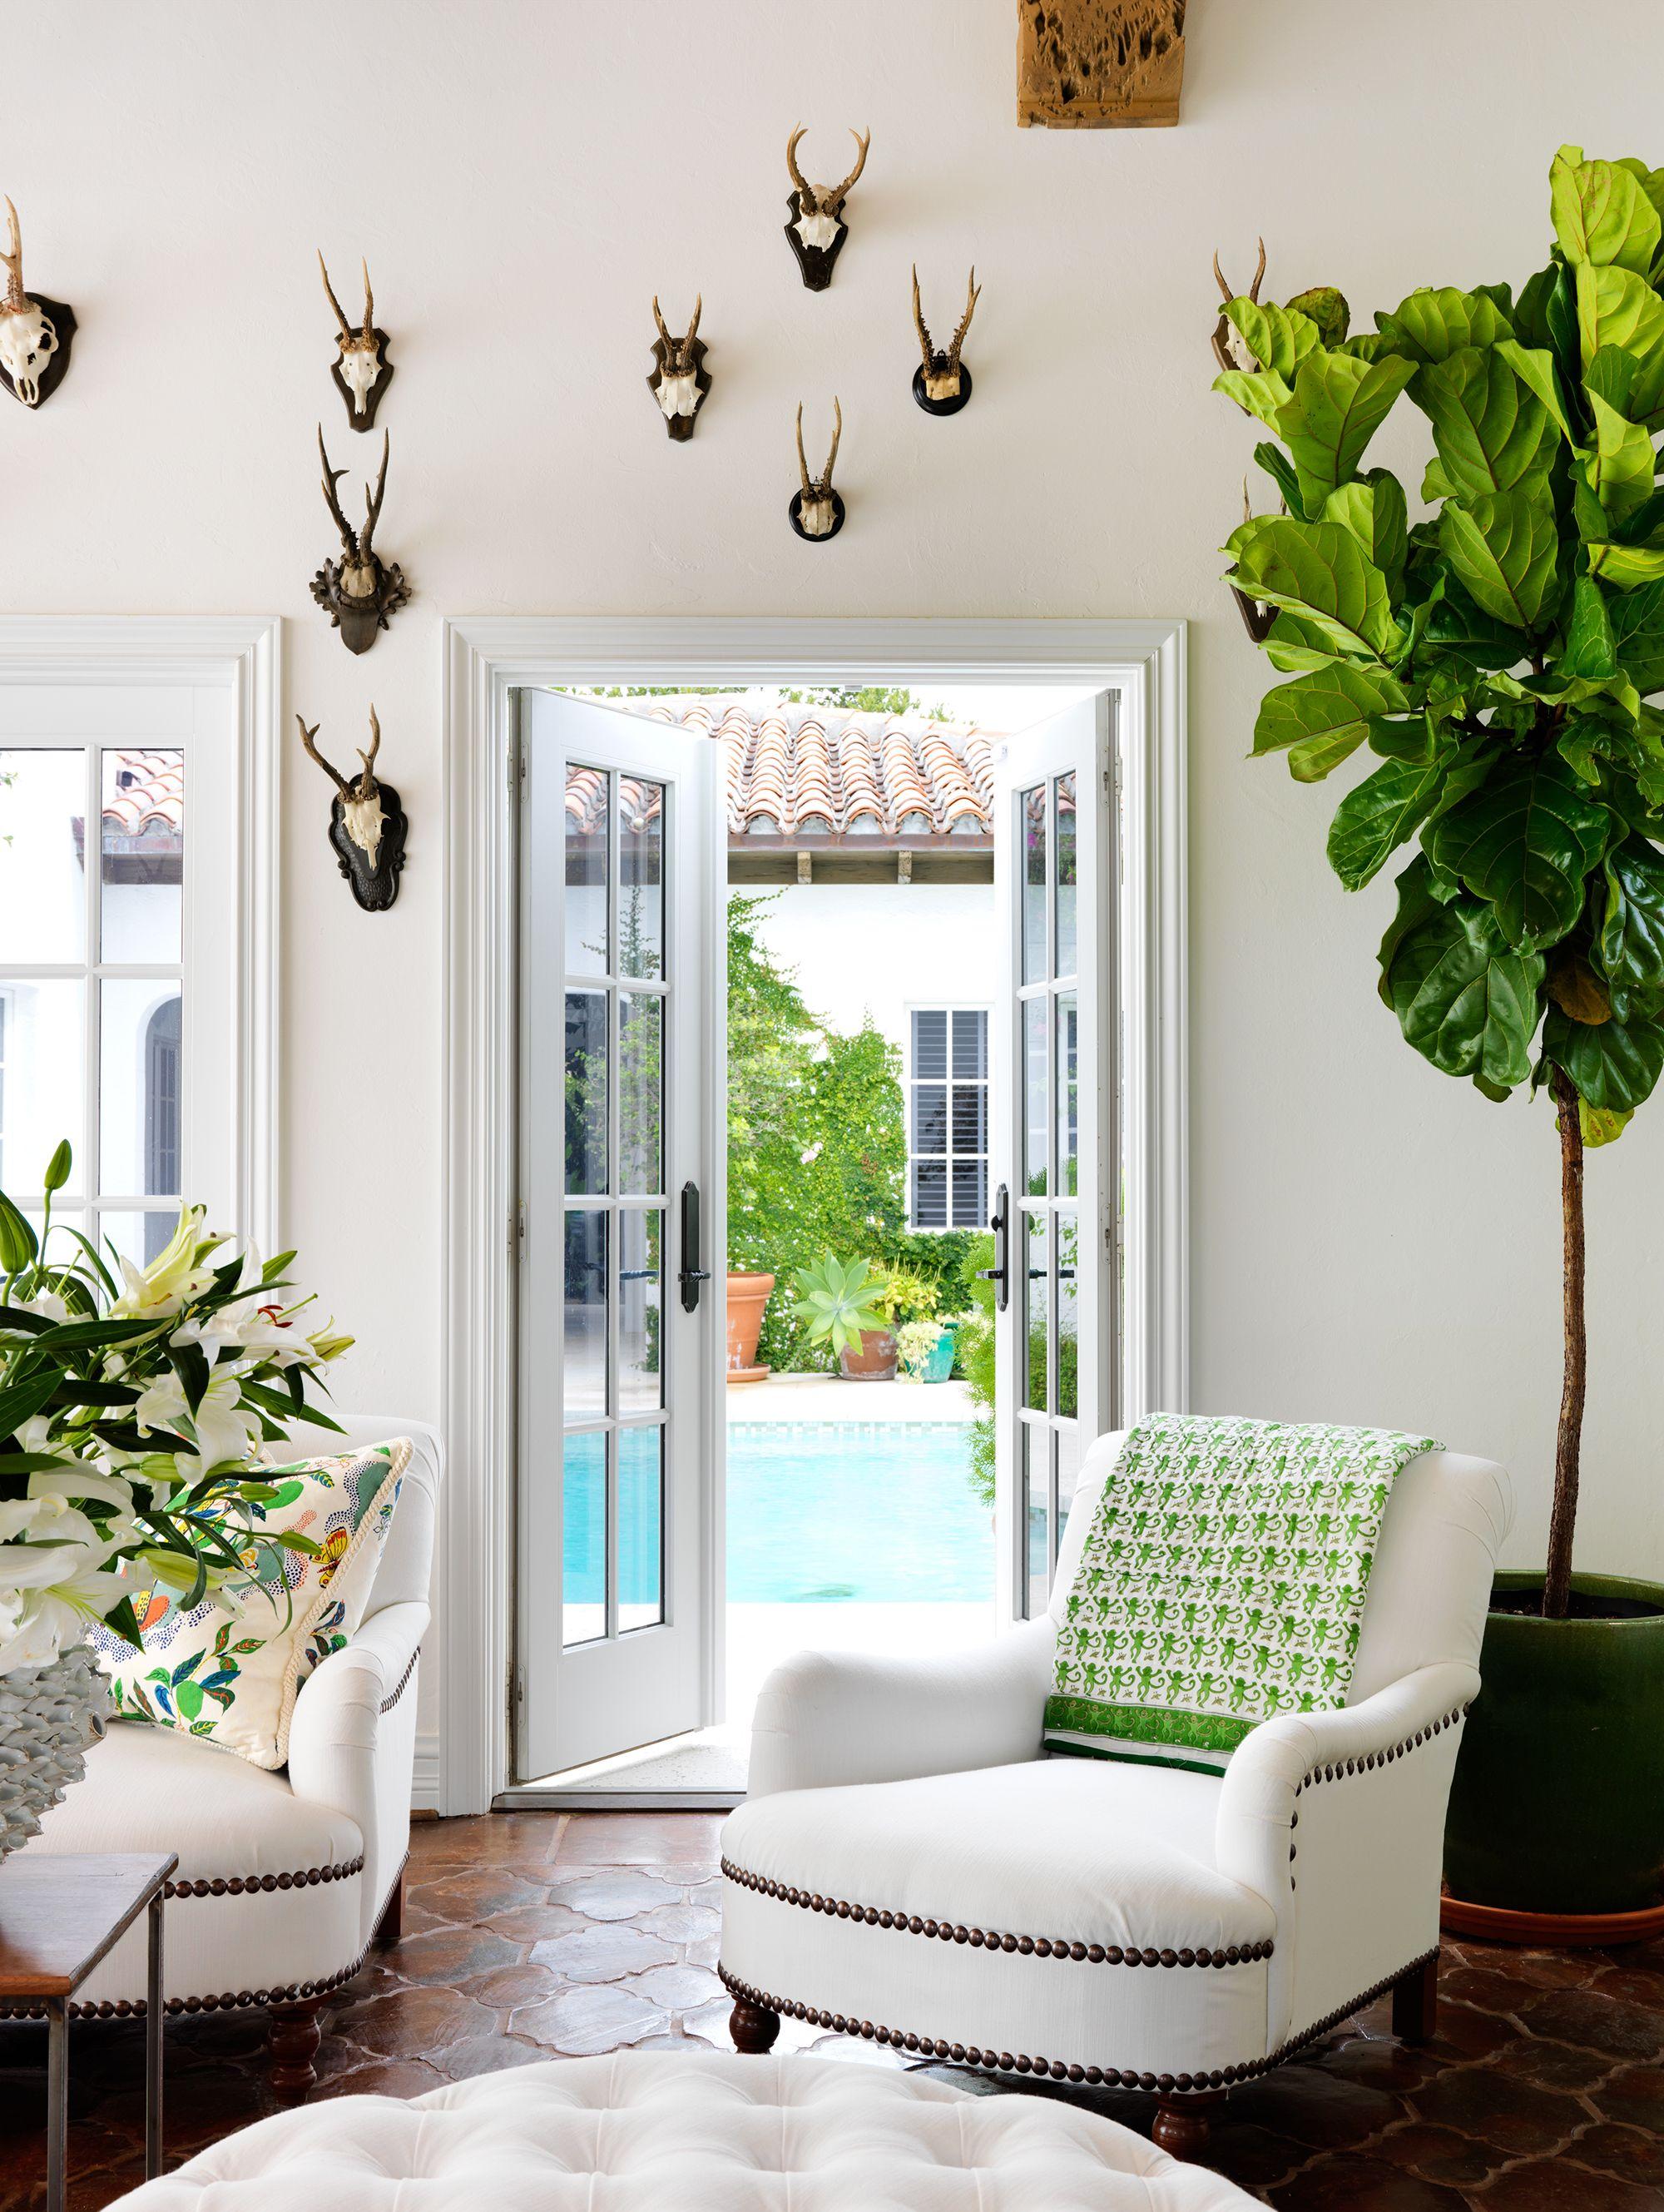 21 Pool House Design Ideas That Feel Like Vacation , Pool